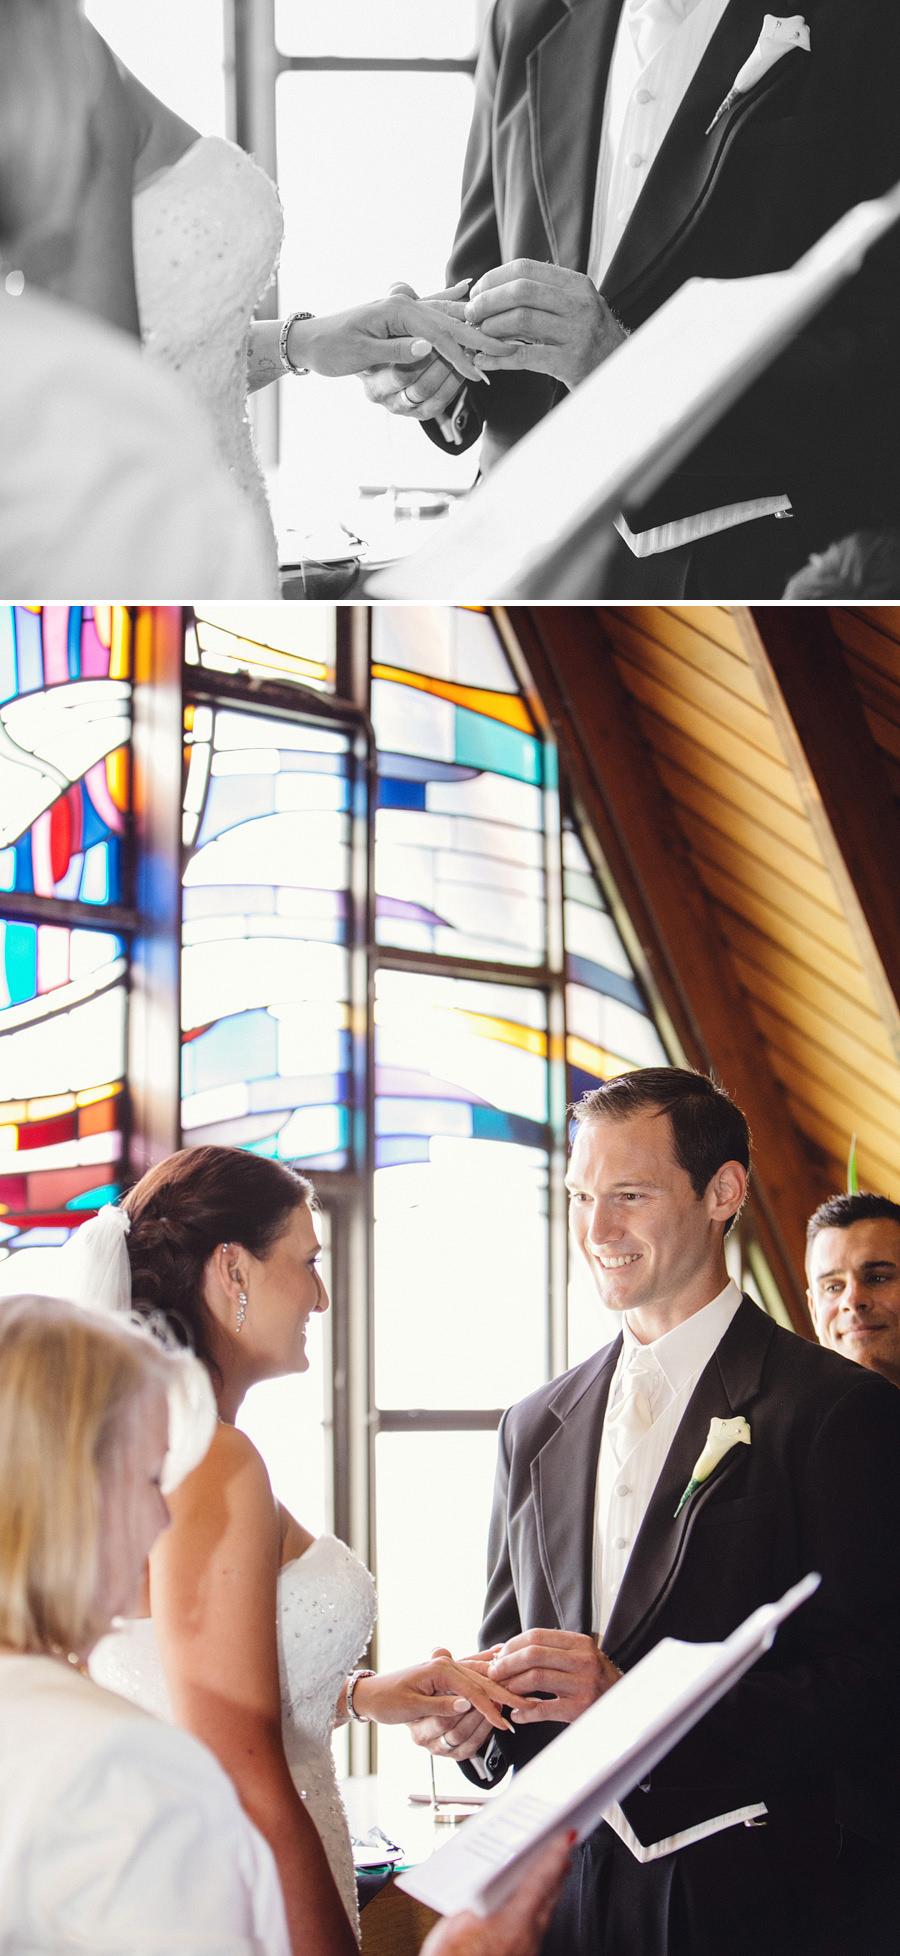 Documentary Wedding Photography: Ceremony